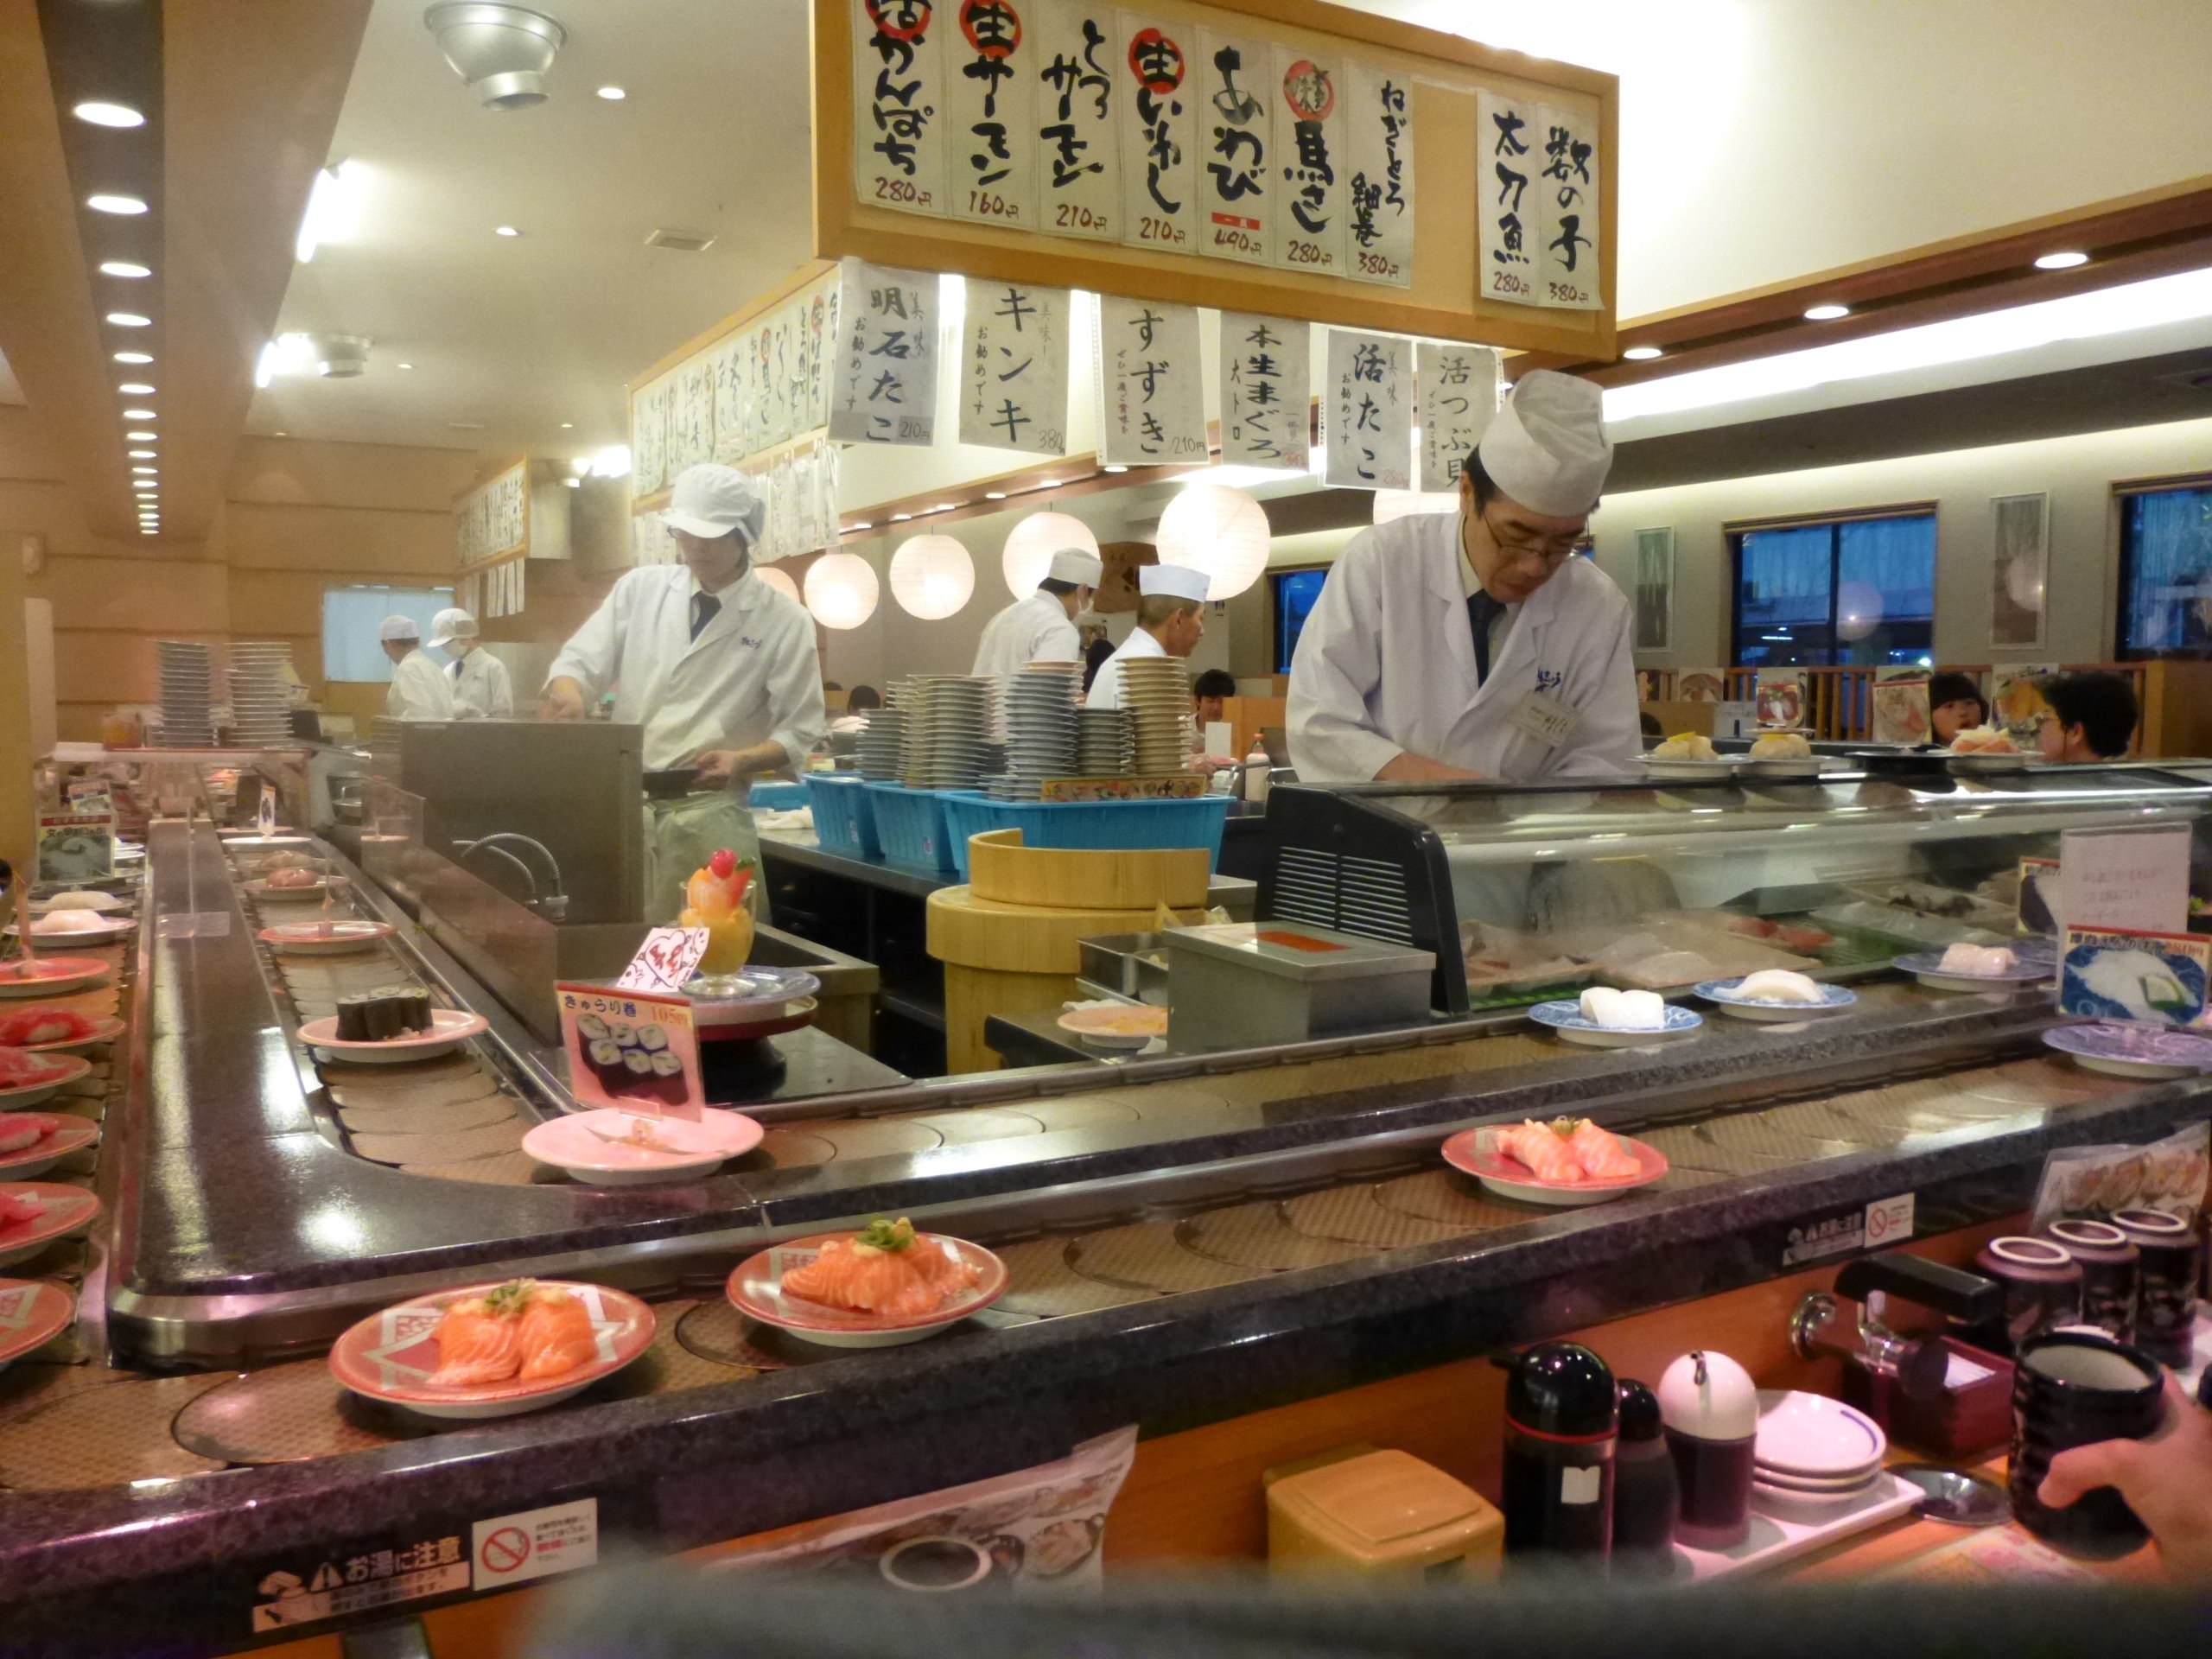 NABEGONの金魚のあぶく回転寿司 さんきゅう 柏木店コメントトラックバック